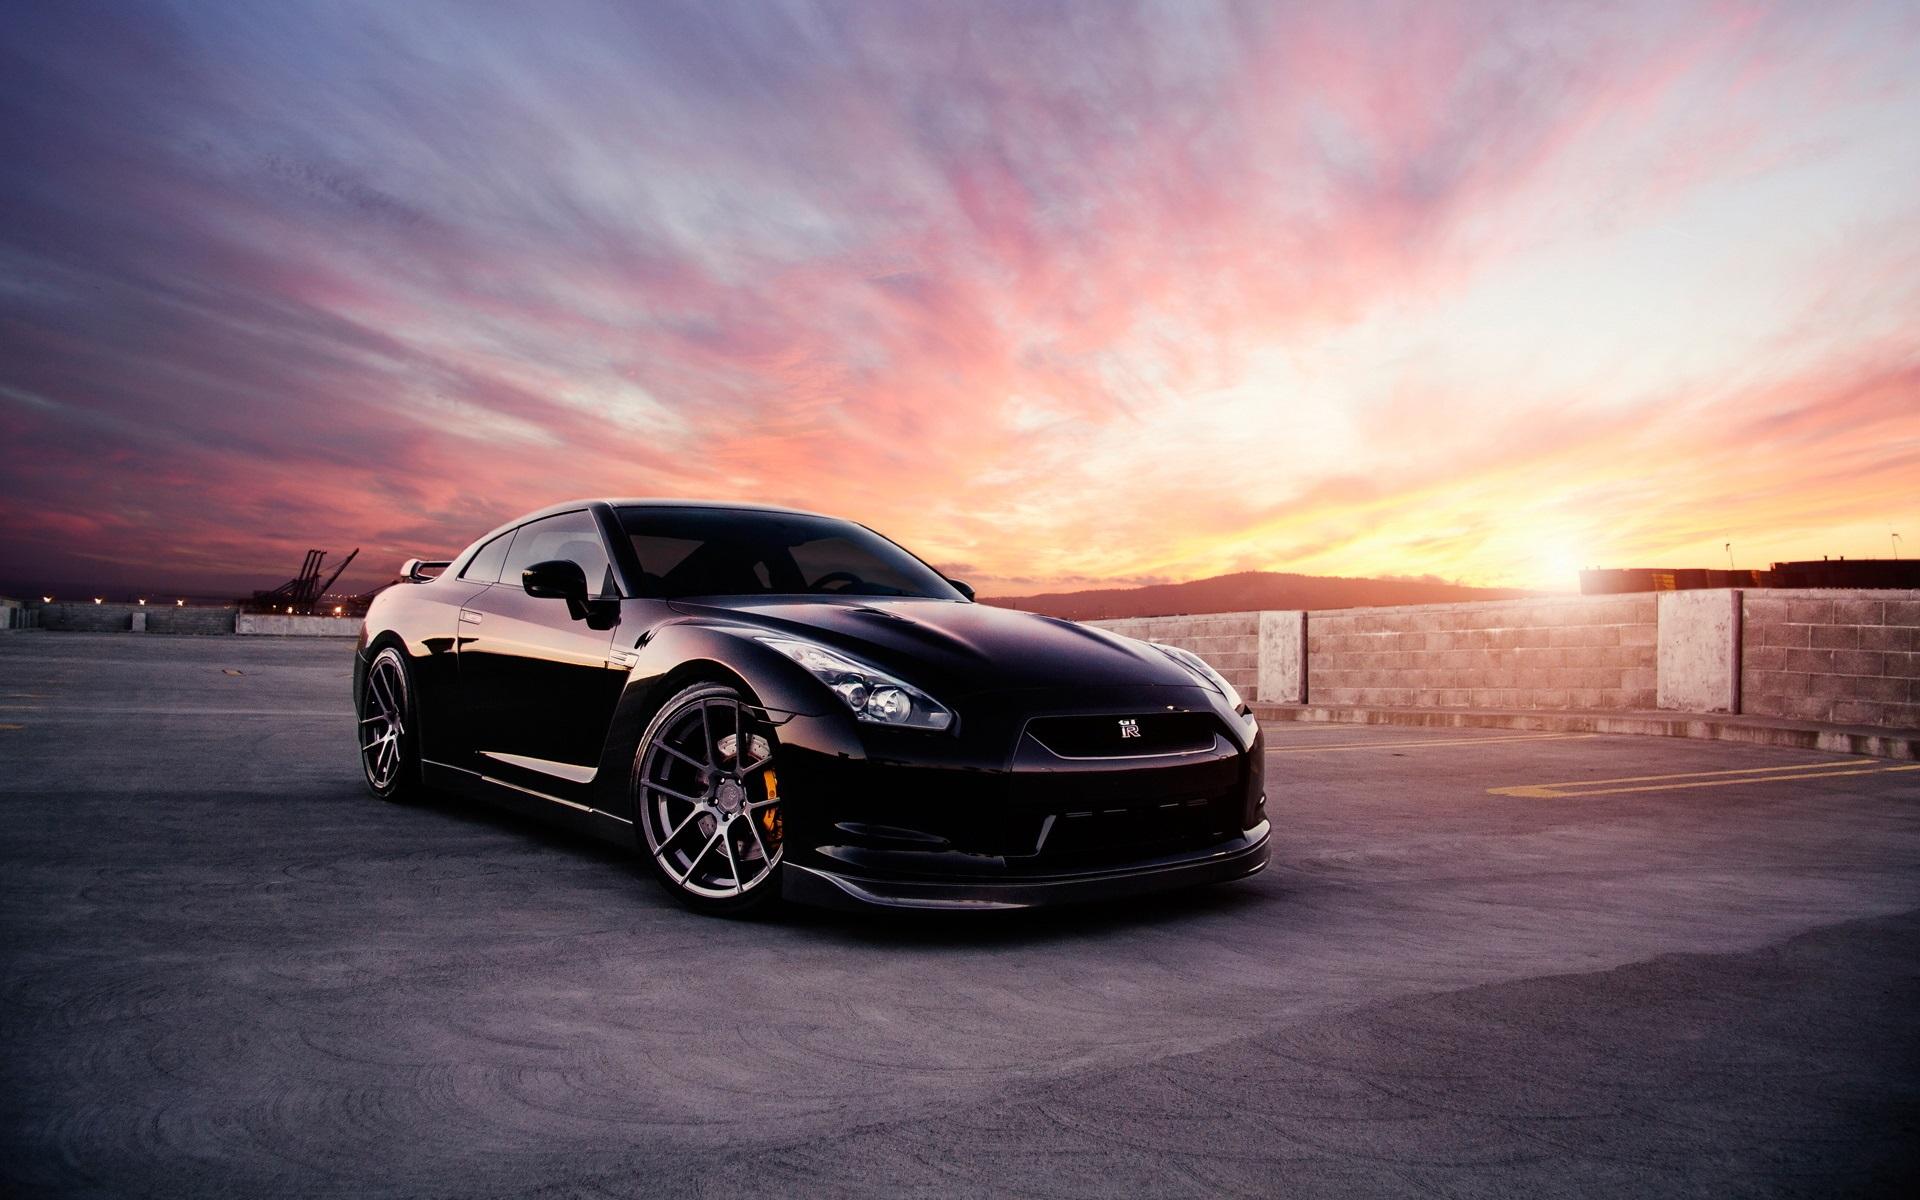 Wallpaper Nissan Gt R Black Car At Sunset 1920x1200 Hd